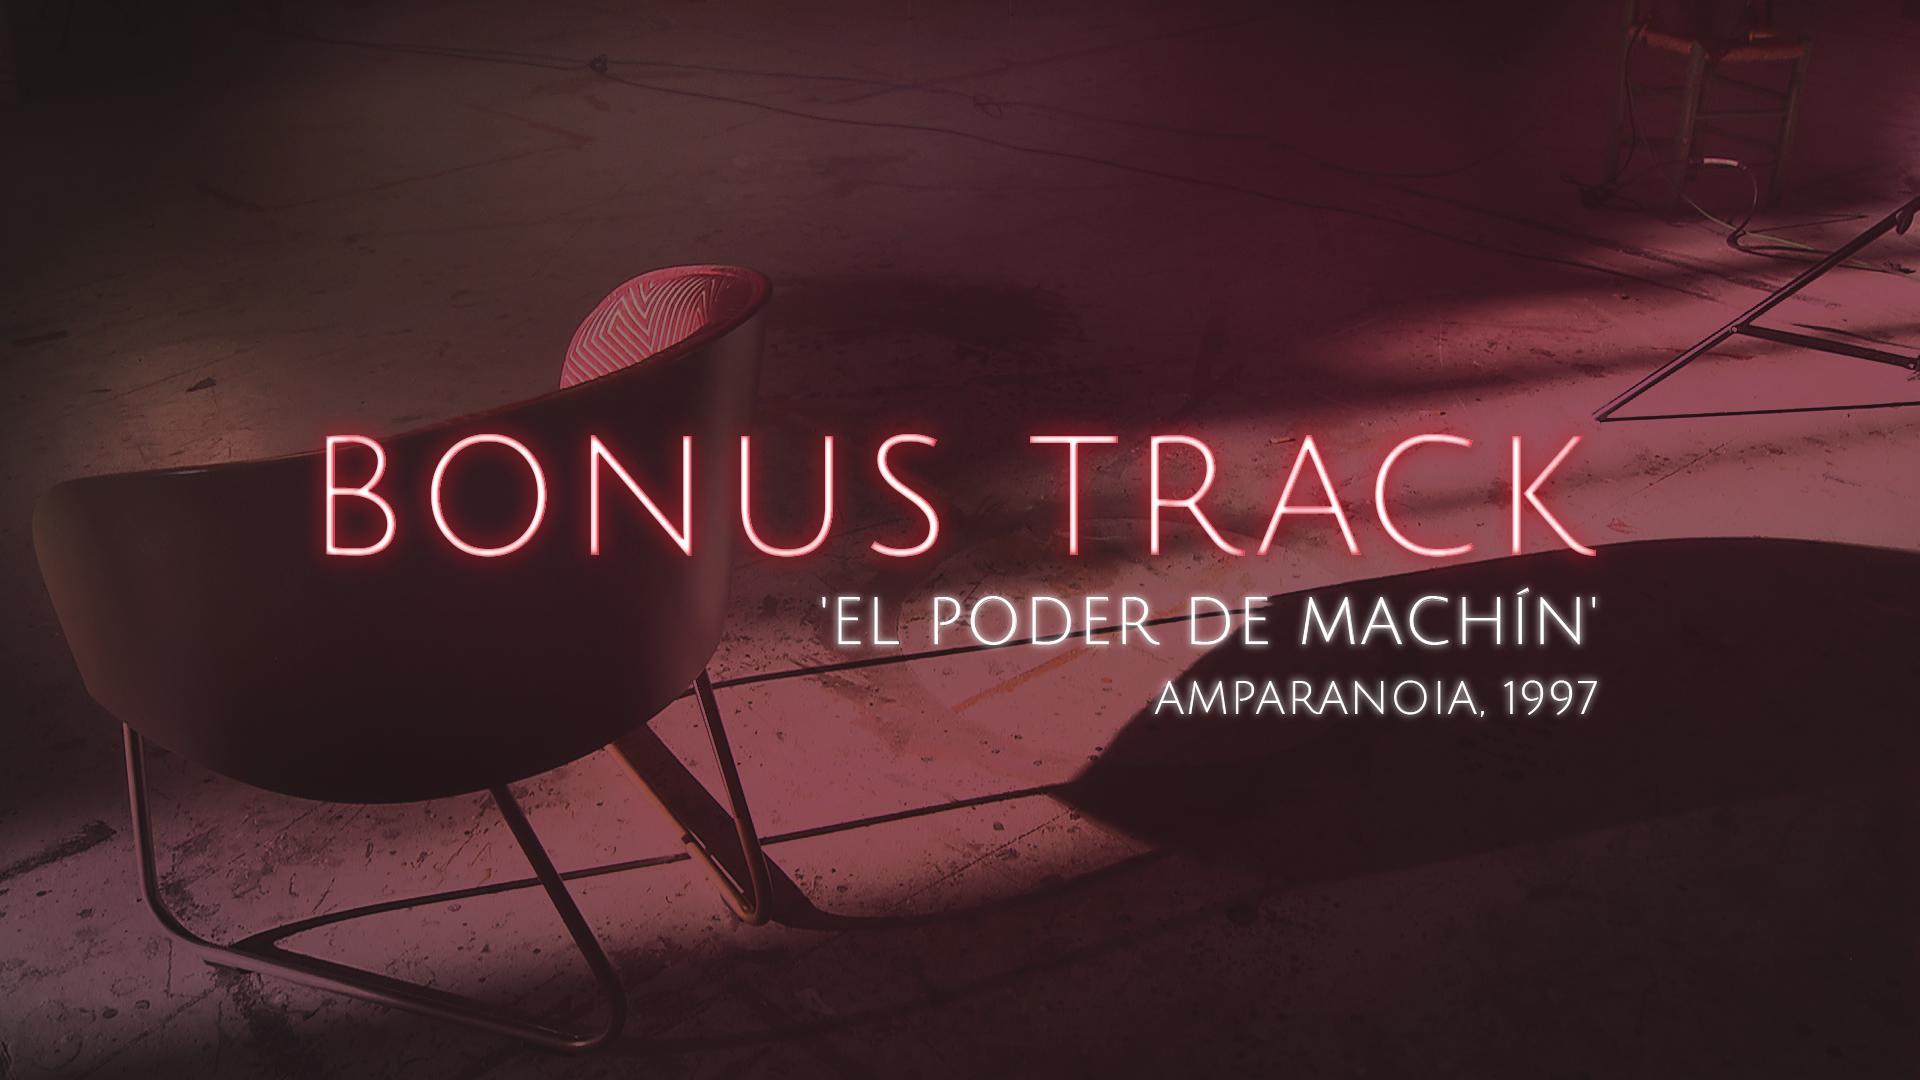 Bonus Track - 'El poder de Machín', Amparanoia (Teaser) - 29/09/17